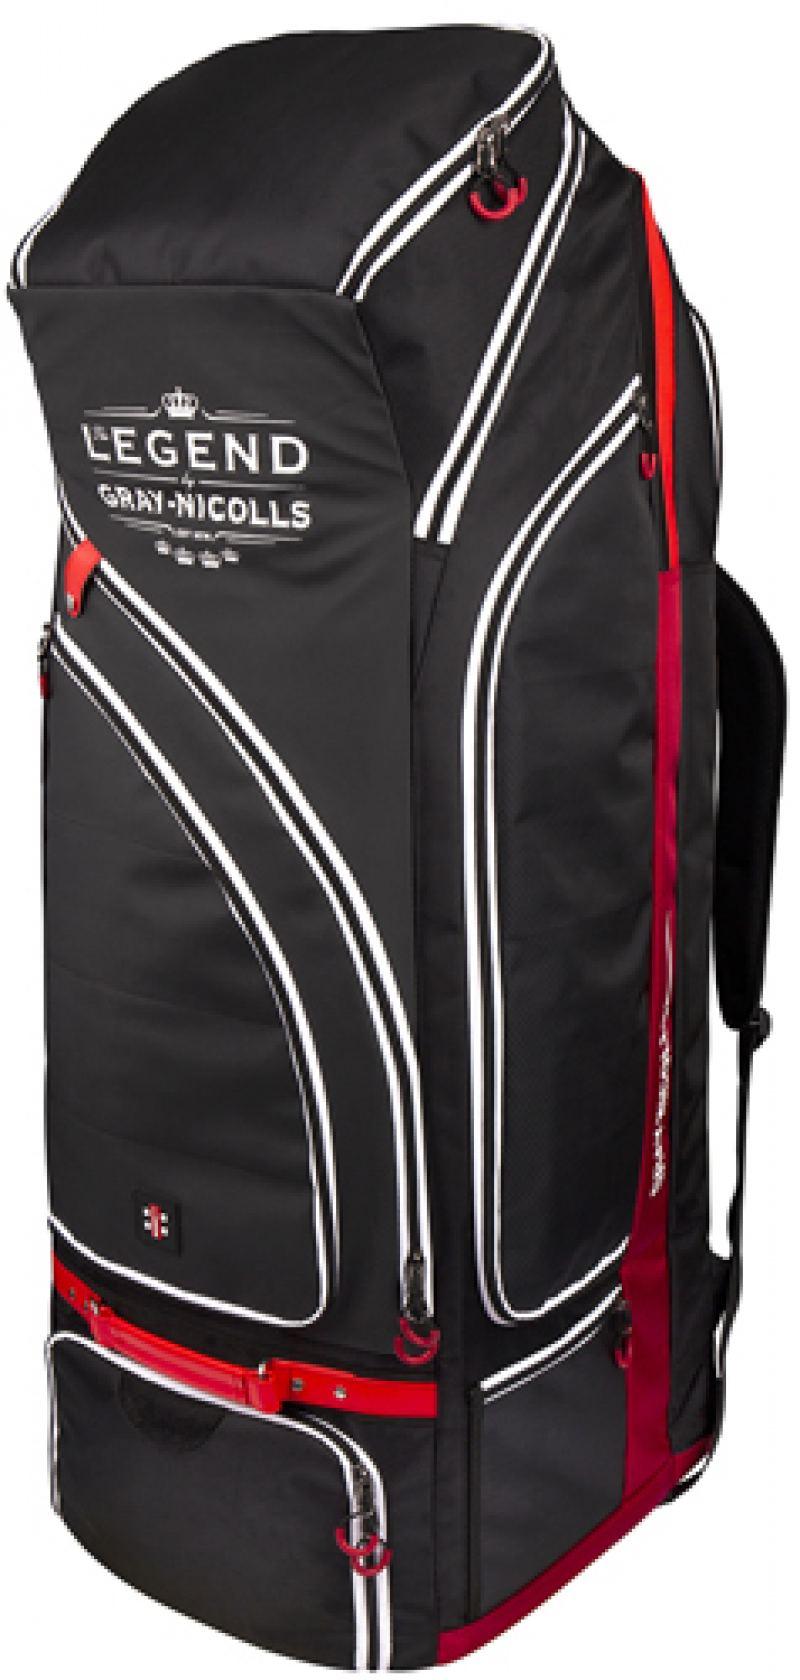 Gray Nicolls Legend Duffle Bag